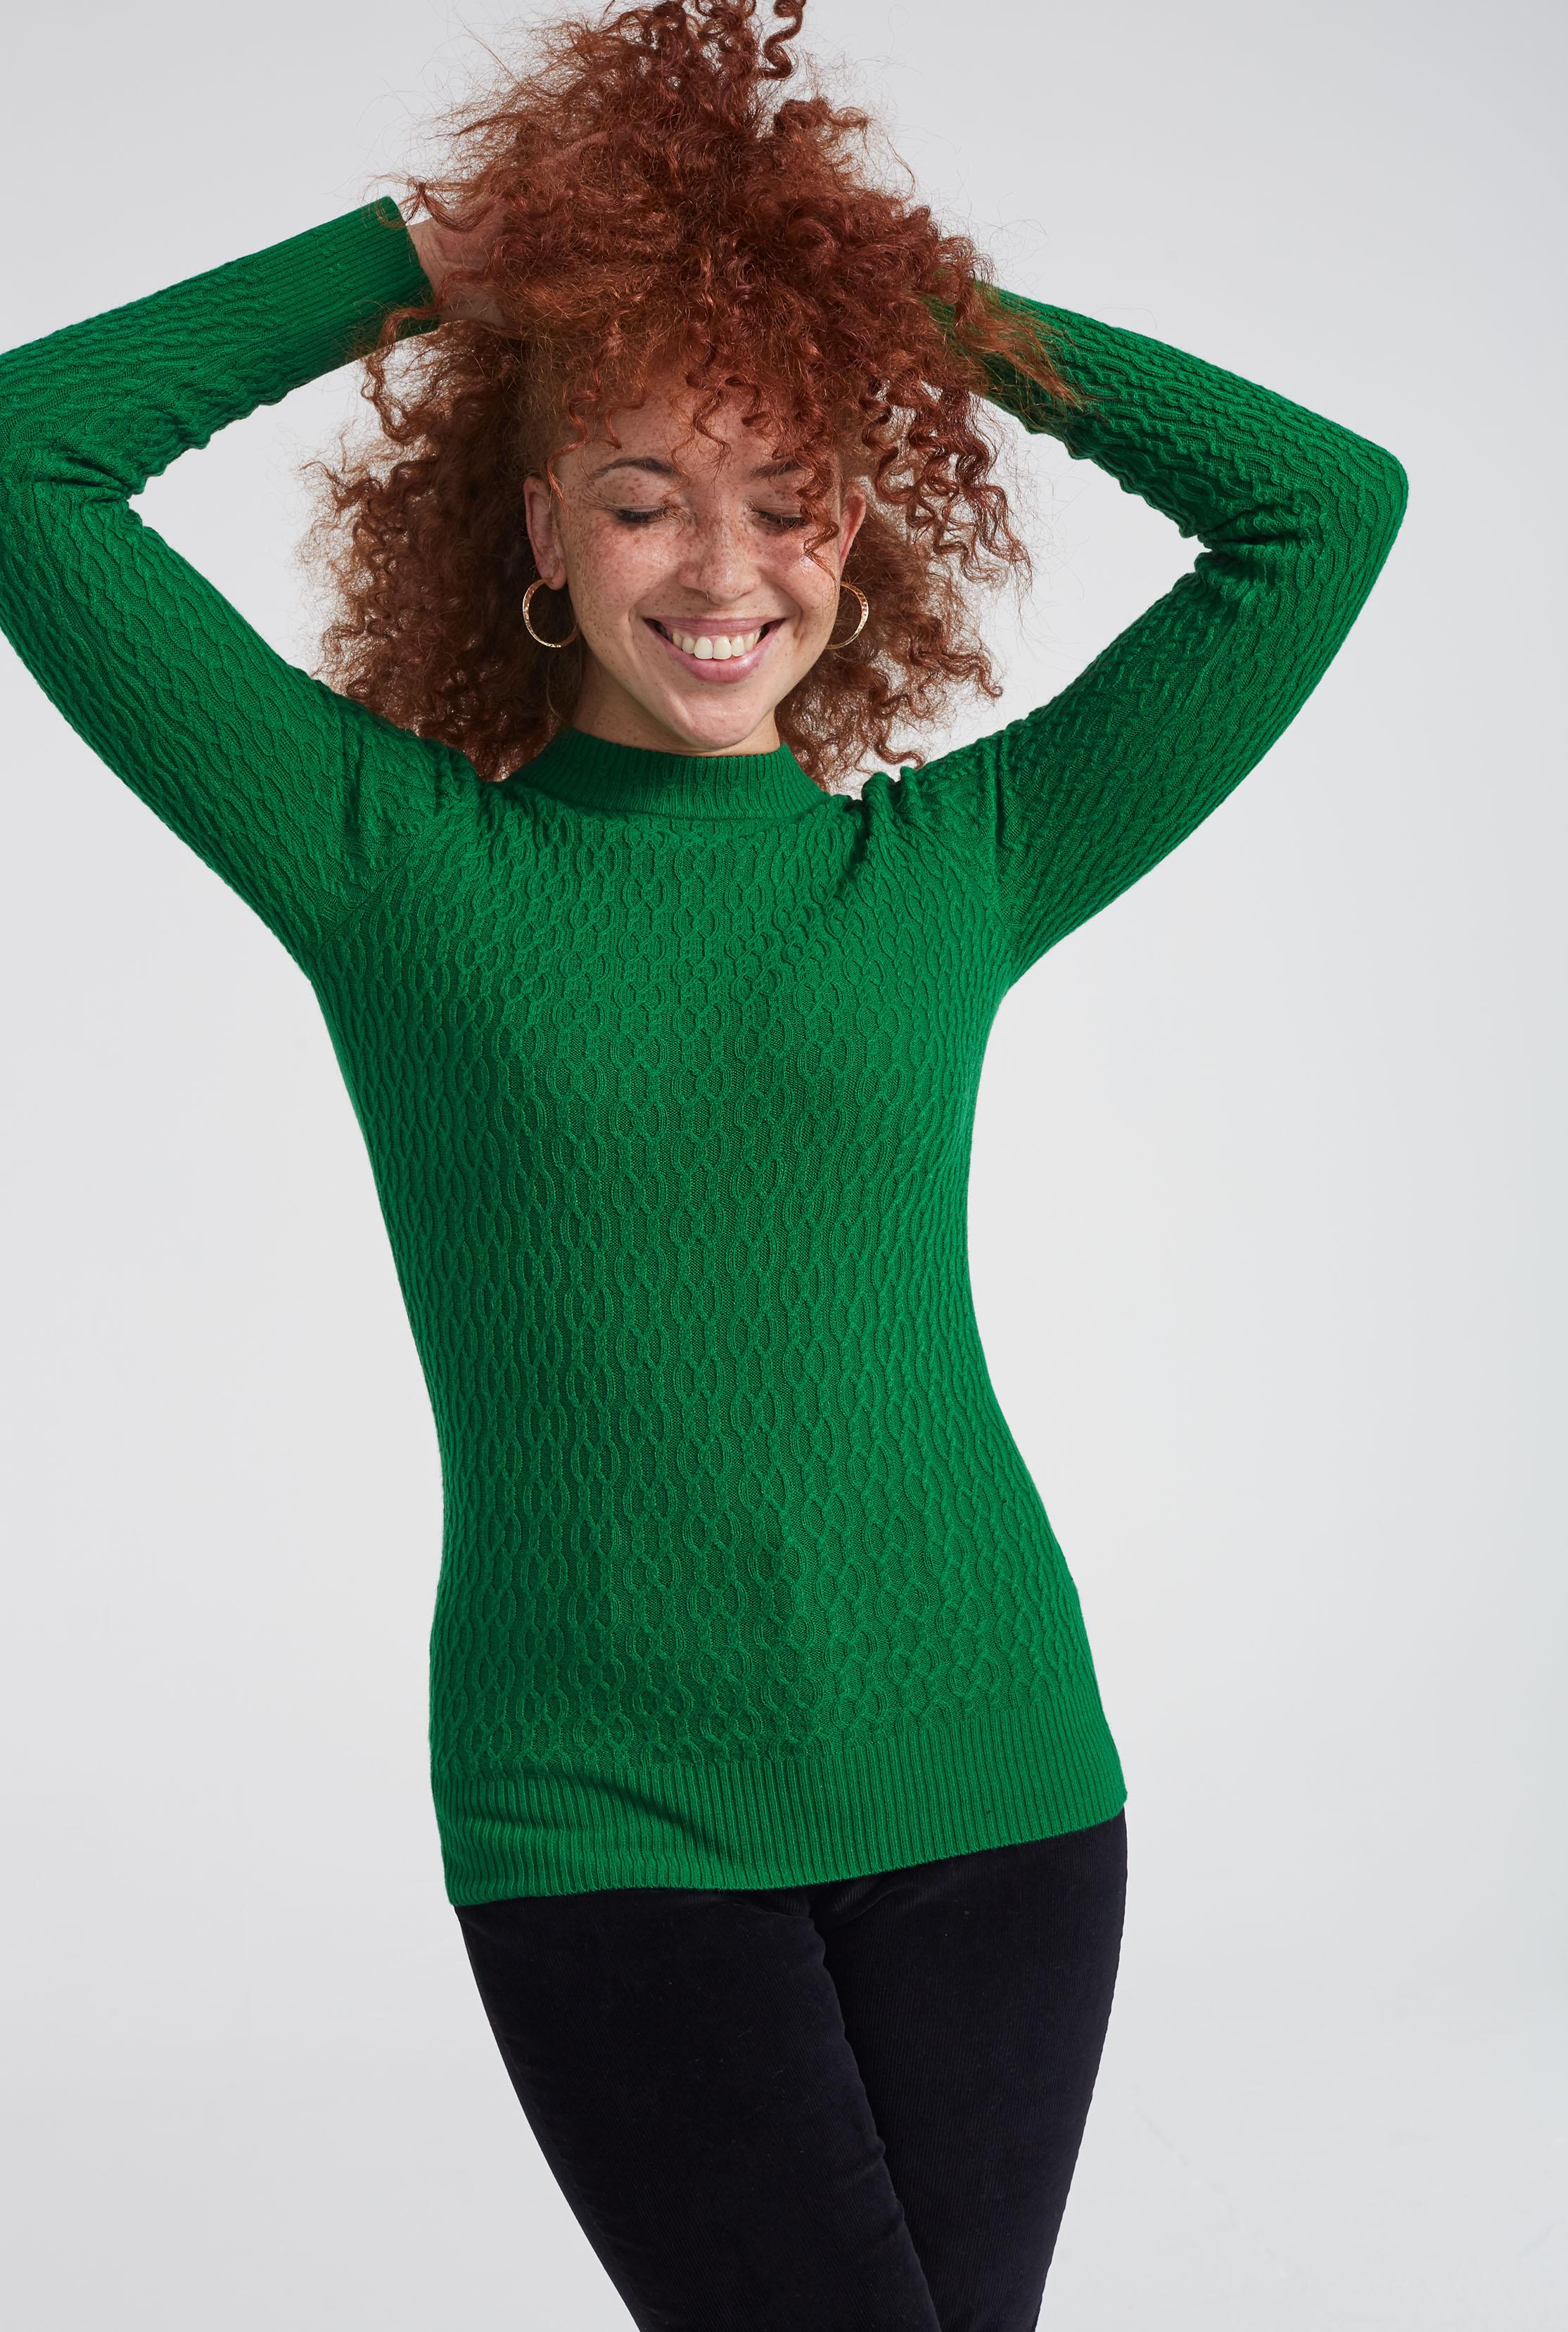 Green Cable Knit Turtleneck Jumper